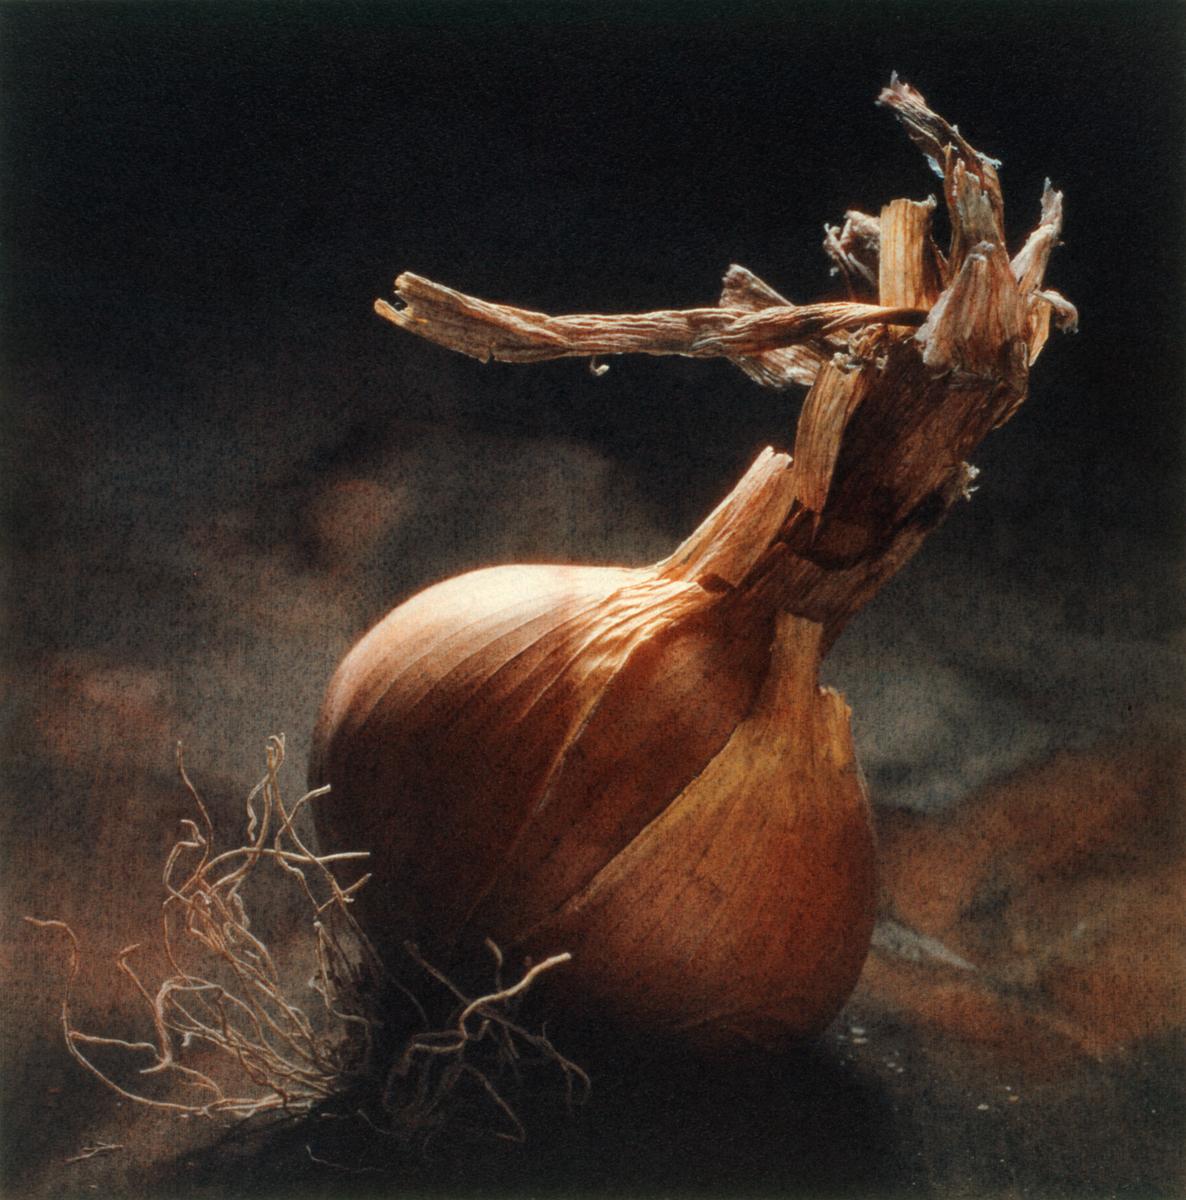 Summer Onion by Cy DeCosse